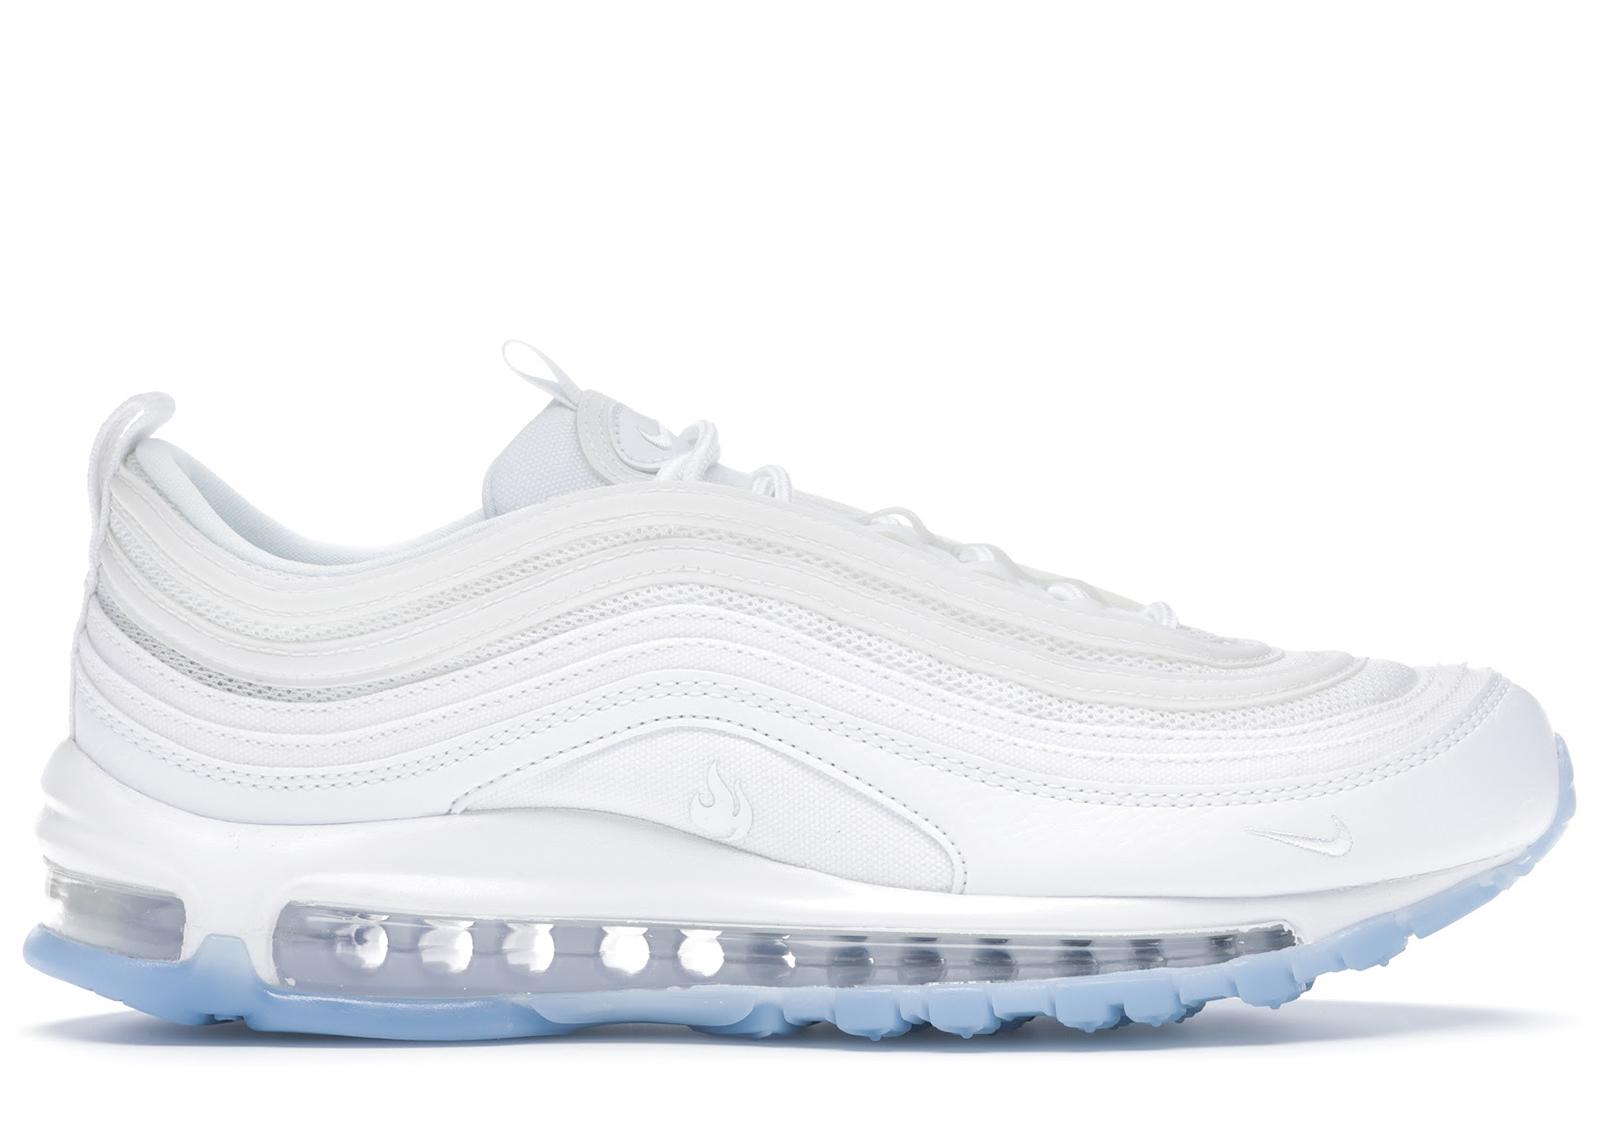 Nike Air Max 97 White Hot - CT4526-100